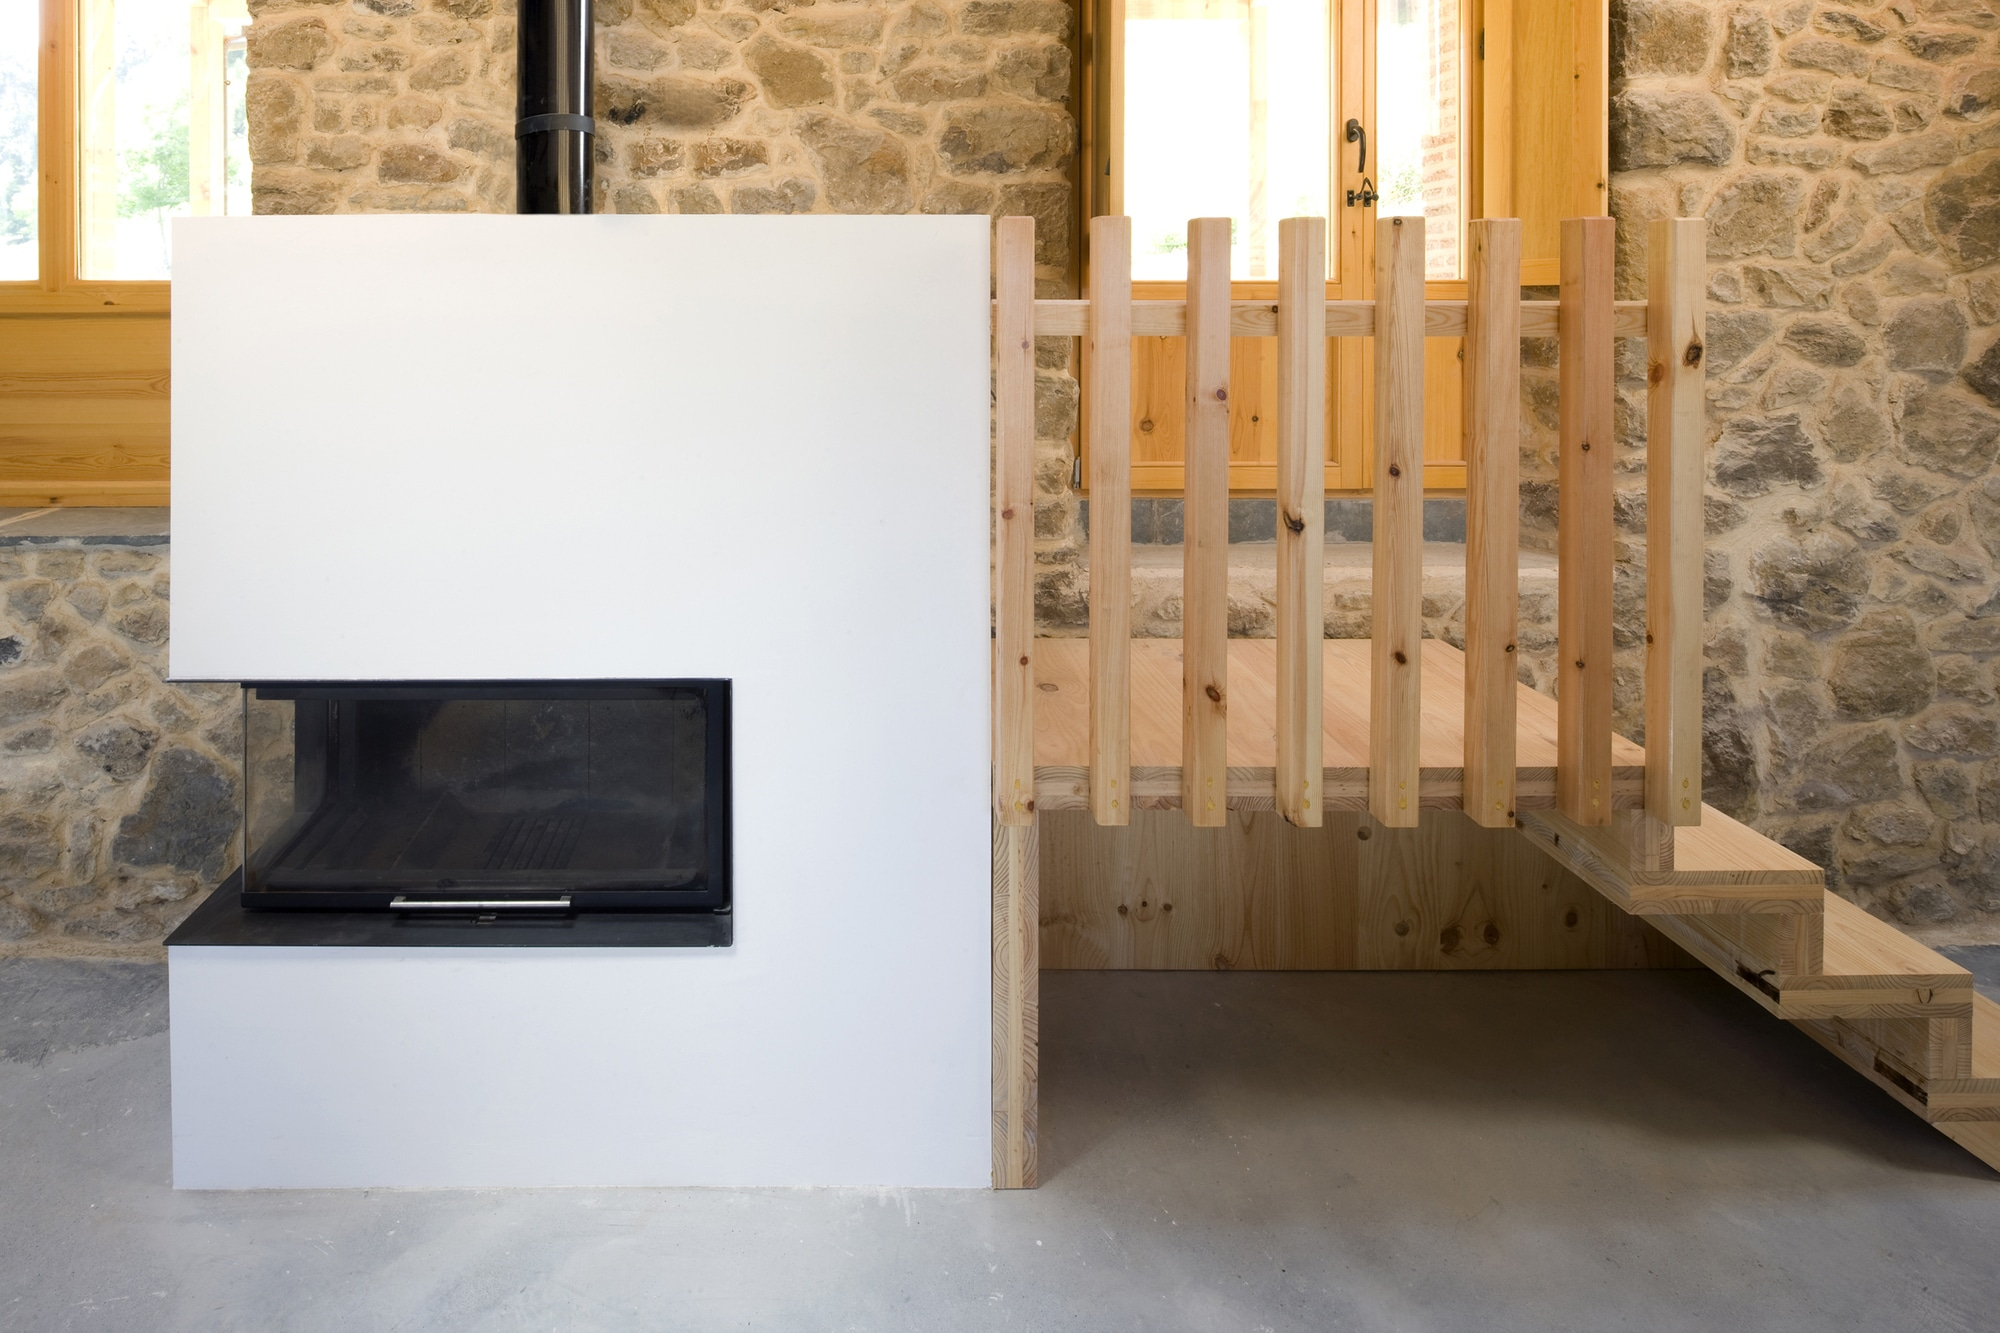 Dise o de casa r stica de piedra planos construye hogar - Casas rurales de madera ...